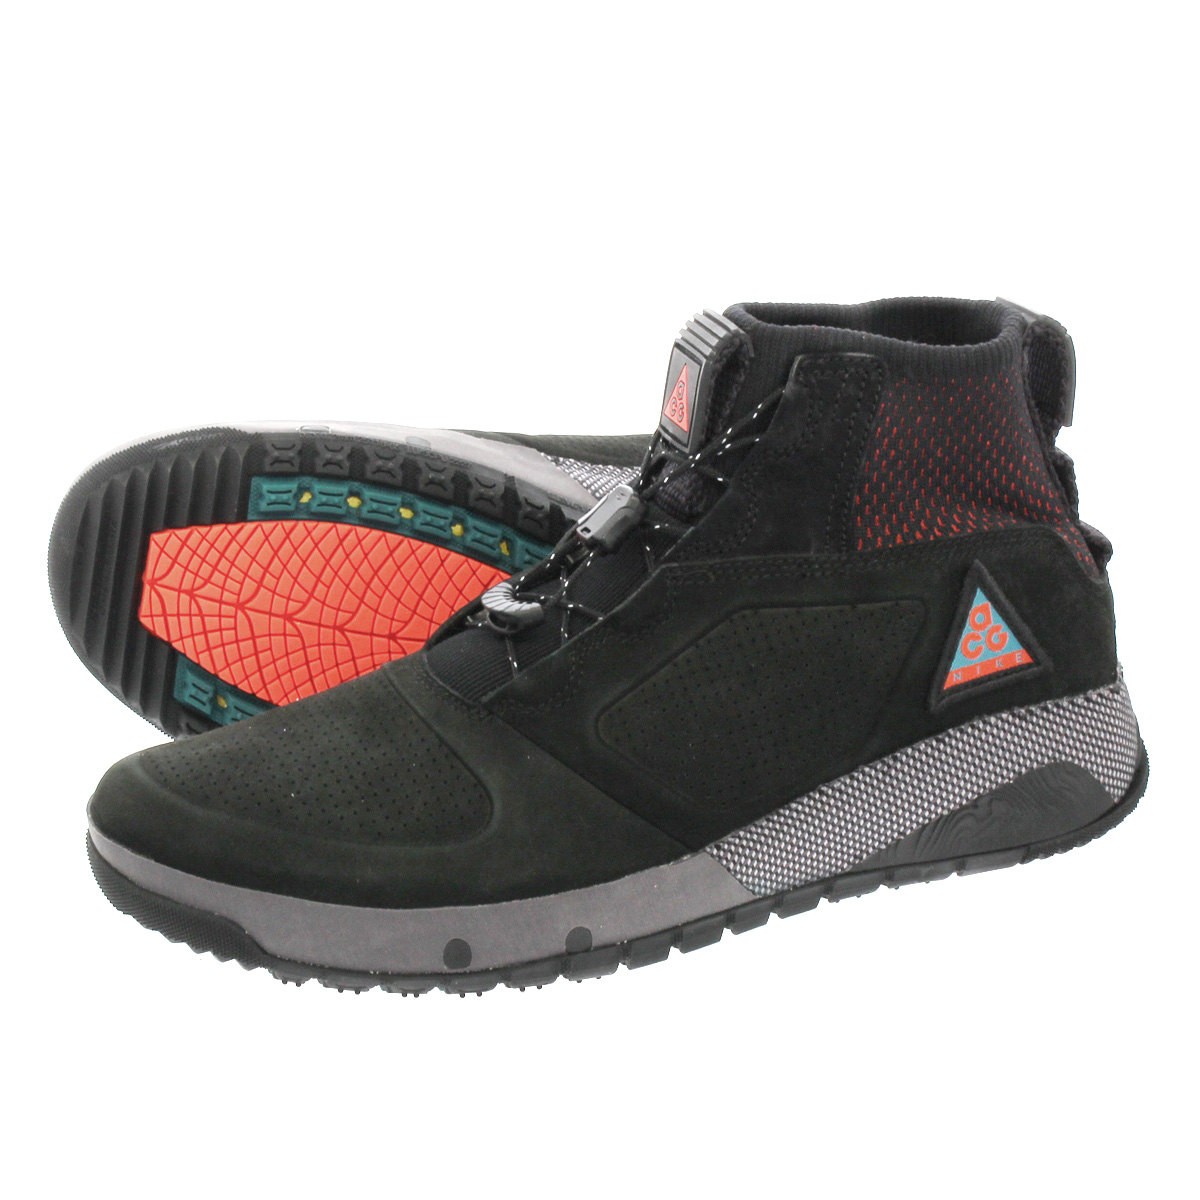 NIKE ACG RUCKEL RIDGE ナイキ ACG ラックルリッジ BLACK/GEODE TEAL/HABANERO RED aq9333-002